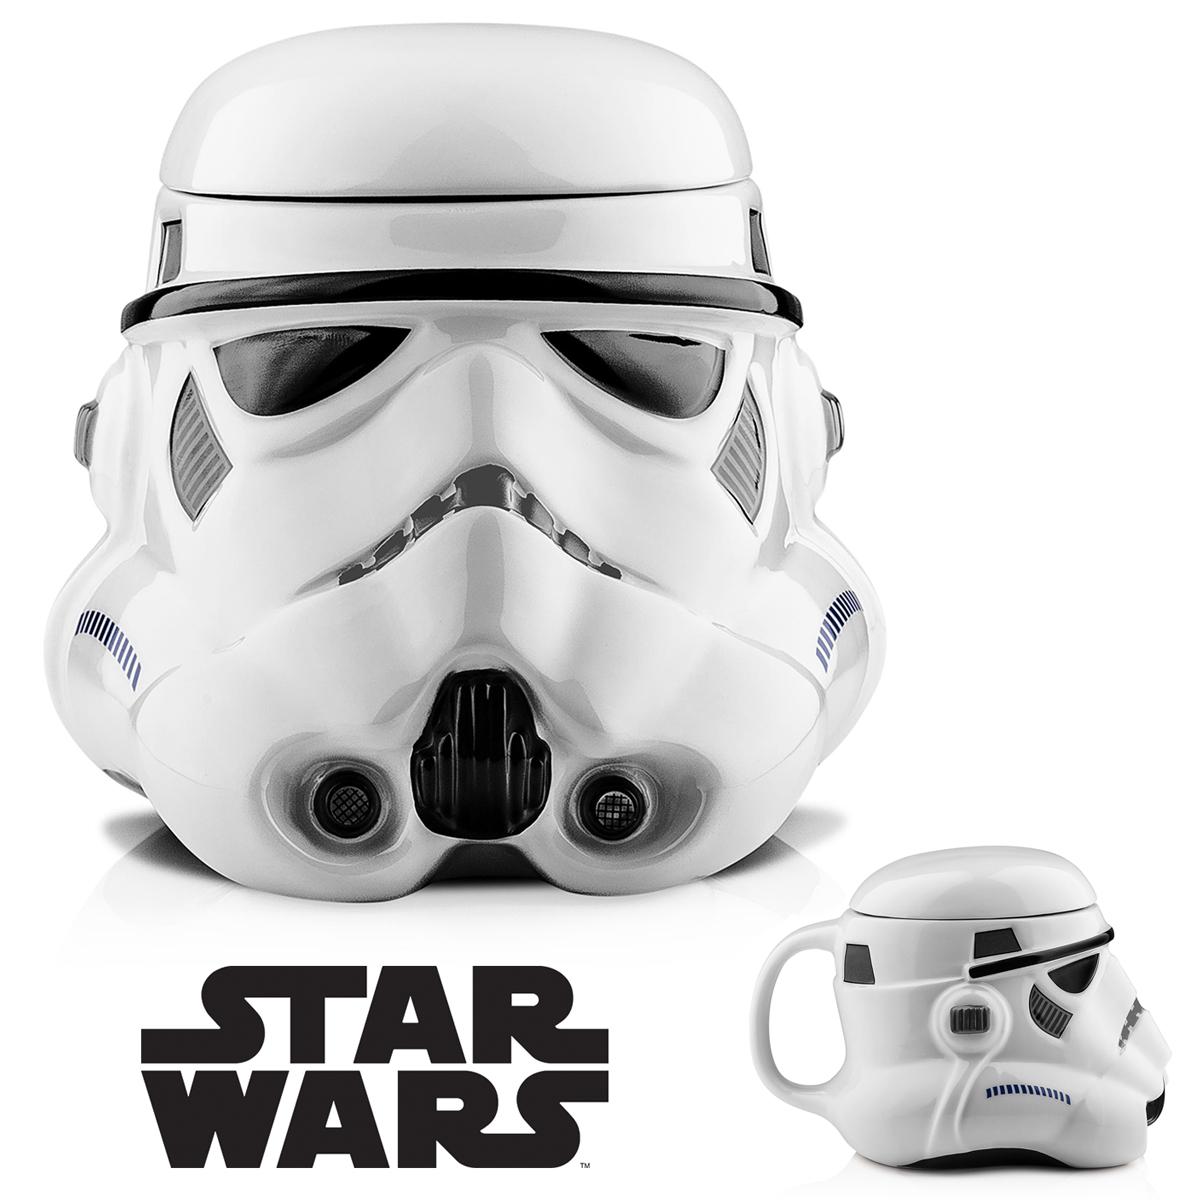 mug 3d stormtrooper c ramique star wars cadeau geek star wars sur cadeaux et. Black Bedroom Furniture Sets. Home Design Ideas